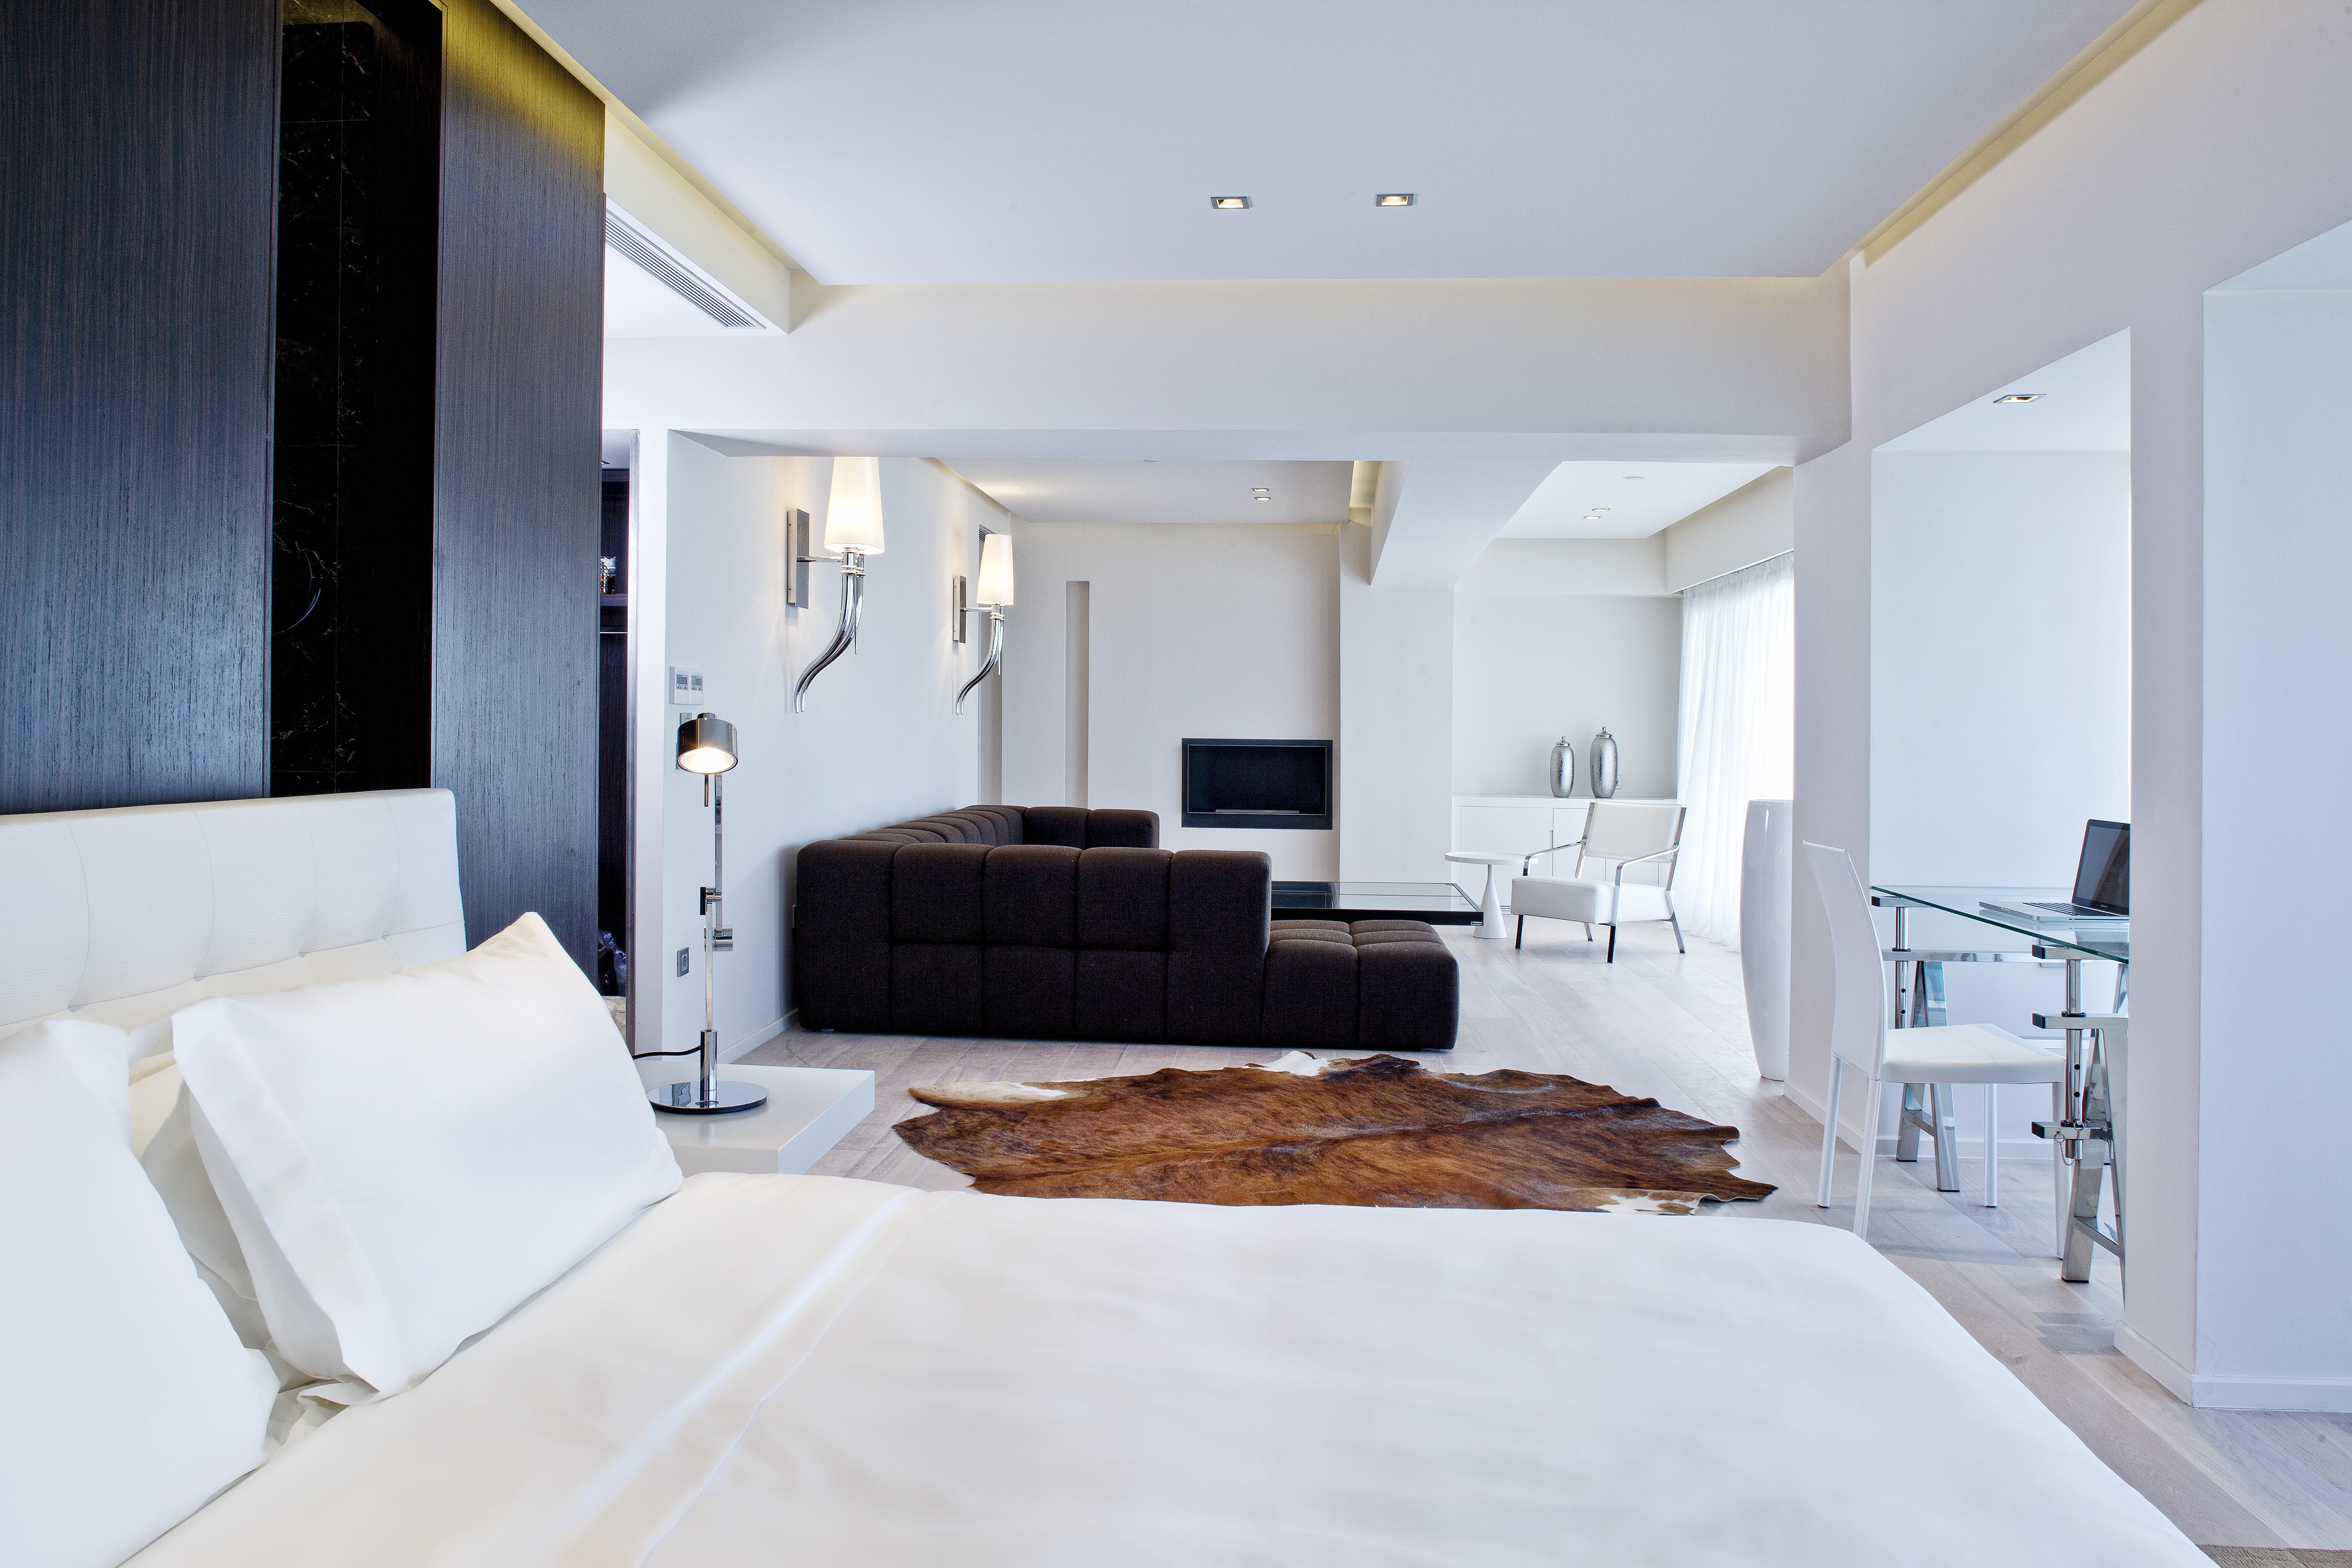 Aqua blu boutique hotel spa luxury hotel in kos greece for Design boutique hotel kos